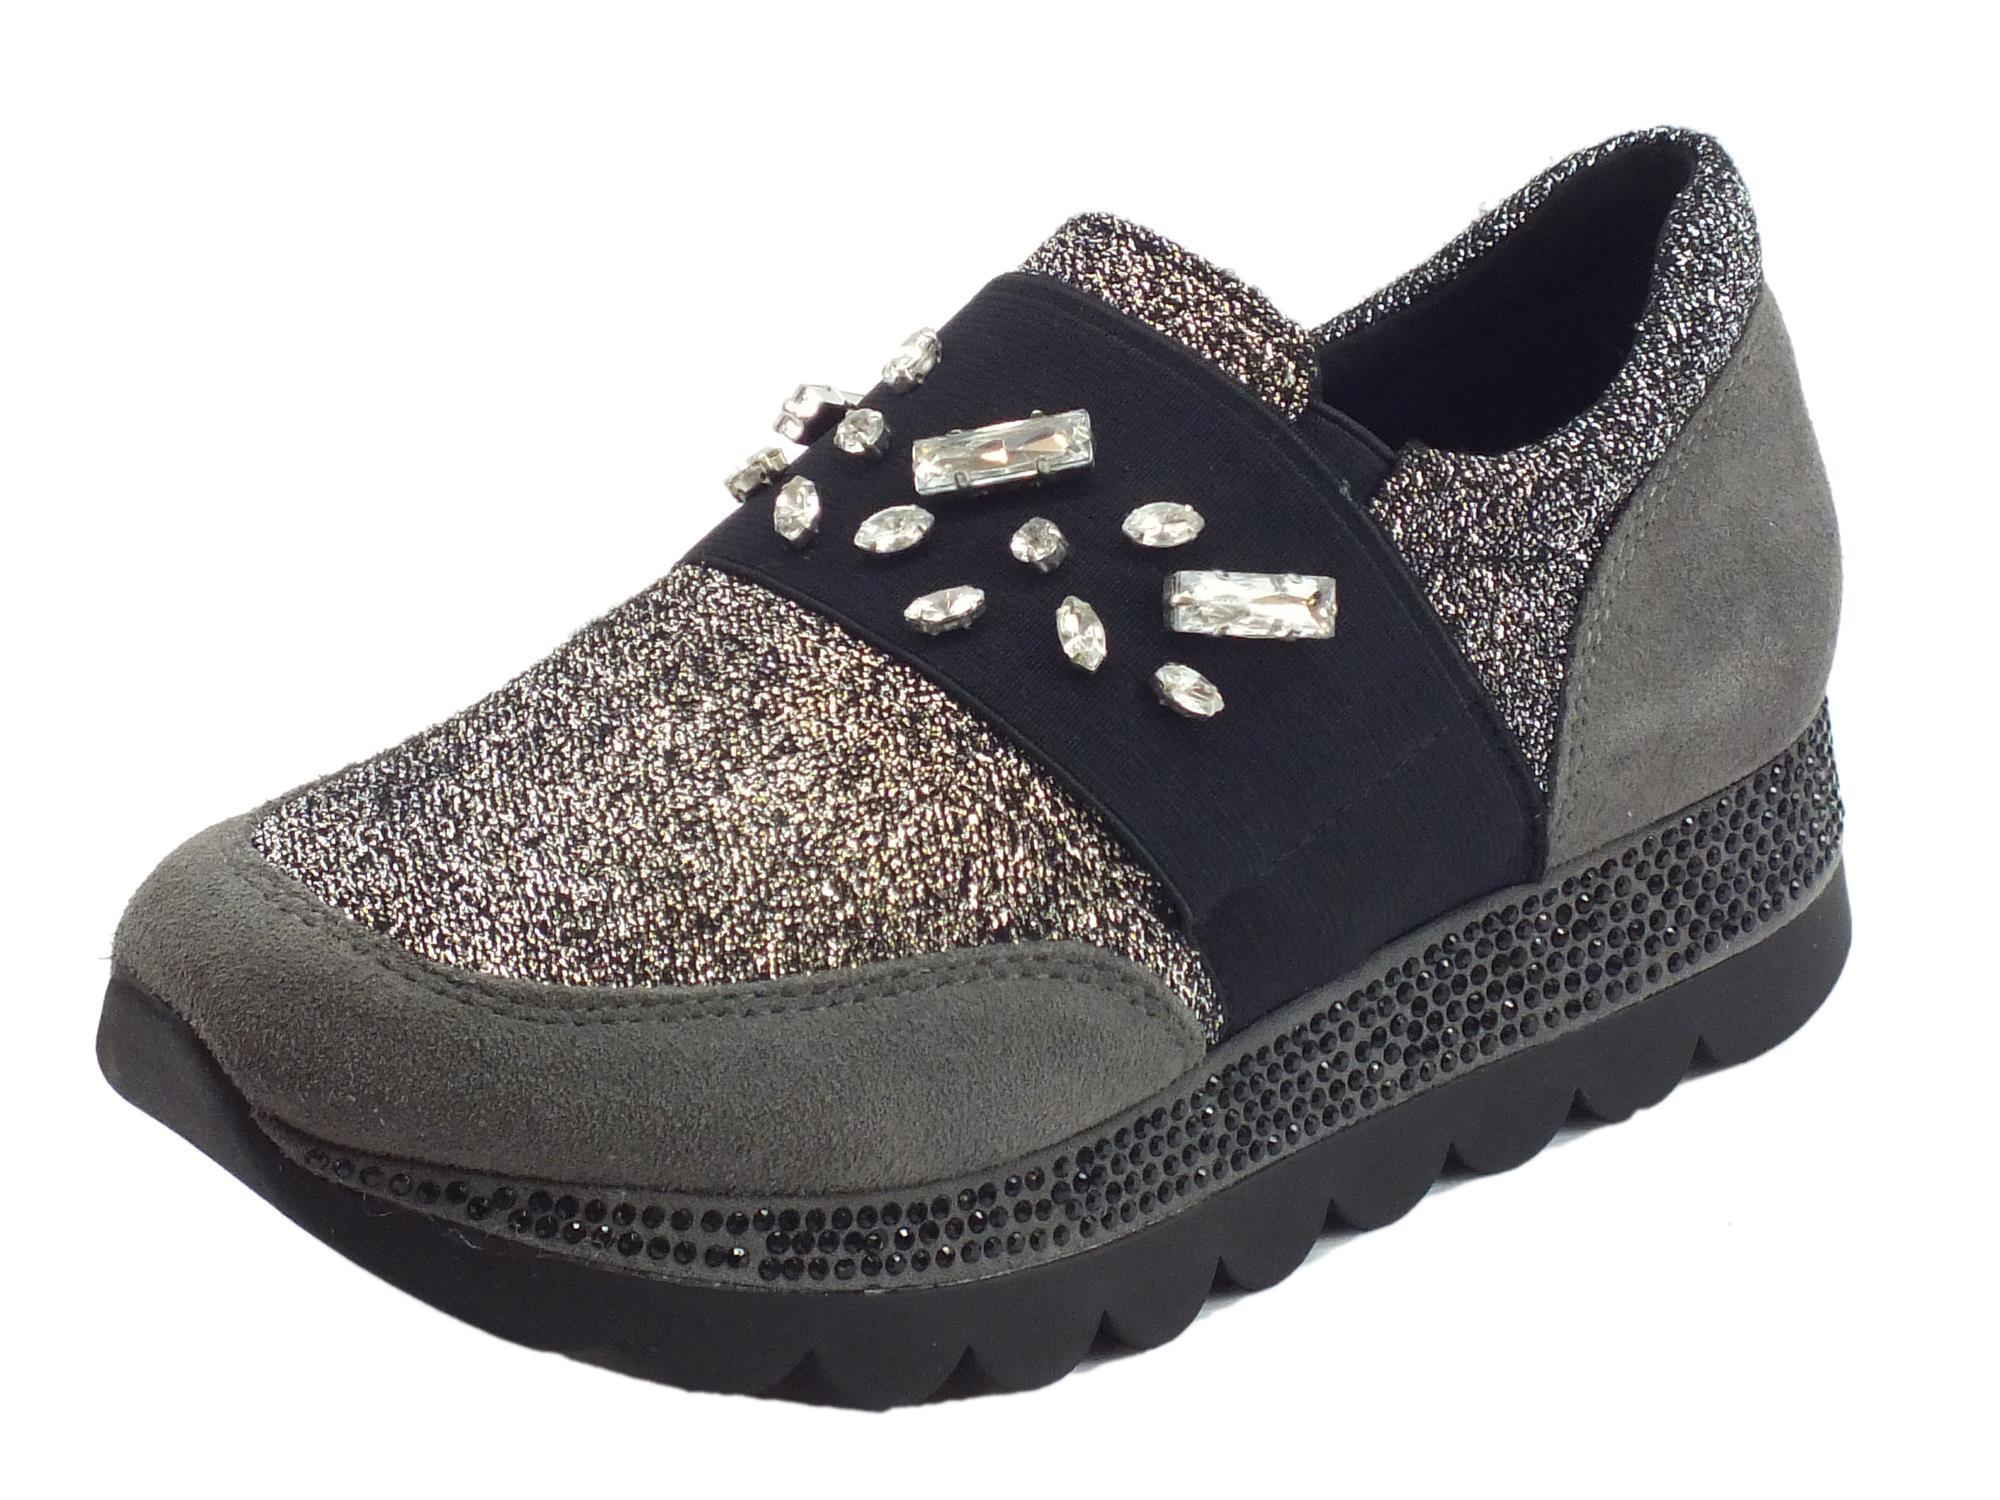 detailed look 39ca7 cc52a Sneakers per donna Cafè Noir in tessuto nero-argento e camoscio grigio